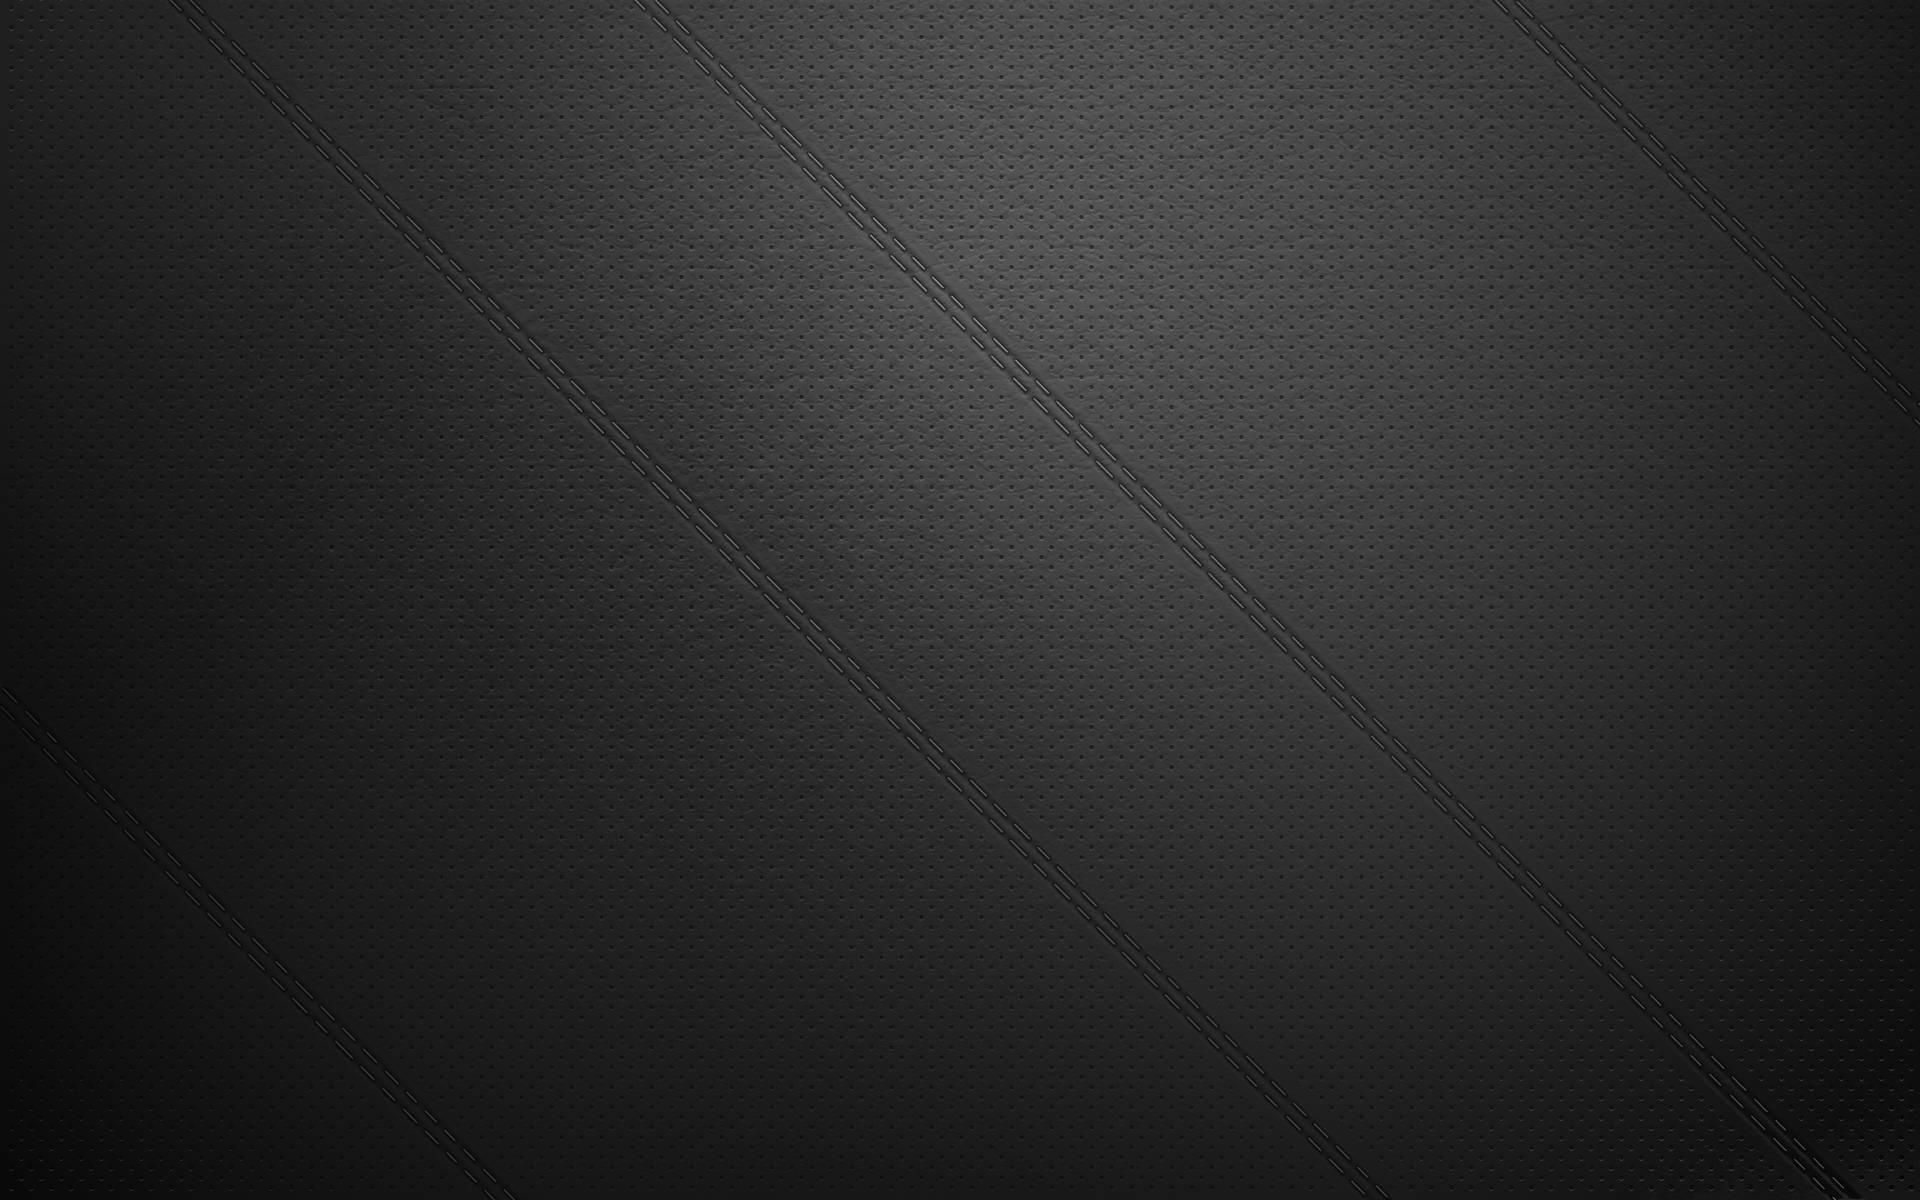 Ubuntu Dark Blue Abstract Wallpaper 6994 Hd Wallpapers 1920x1200